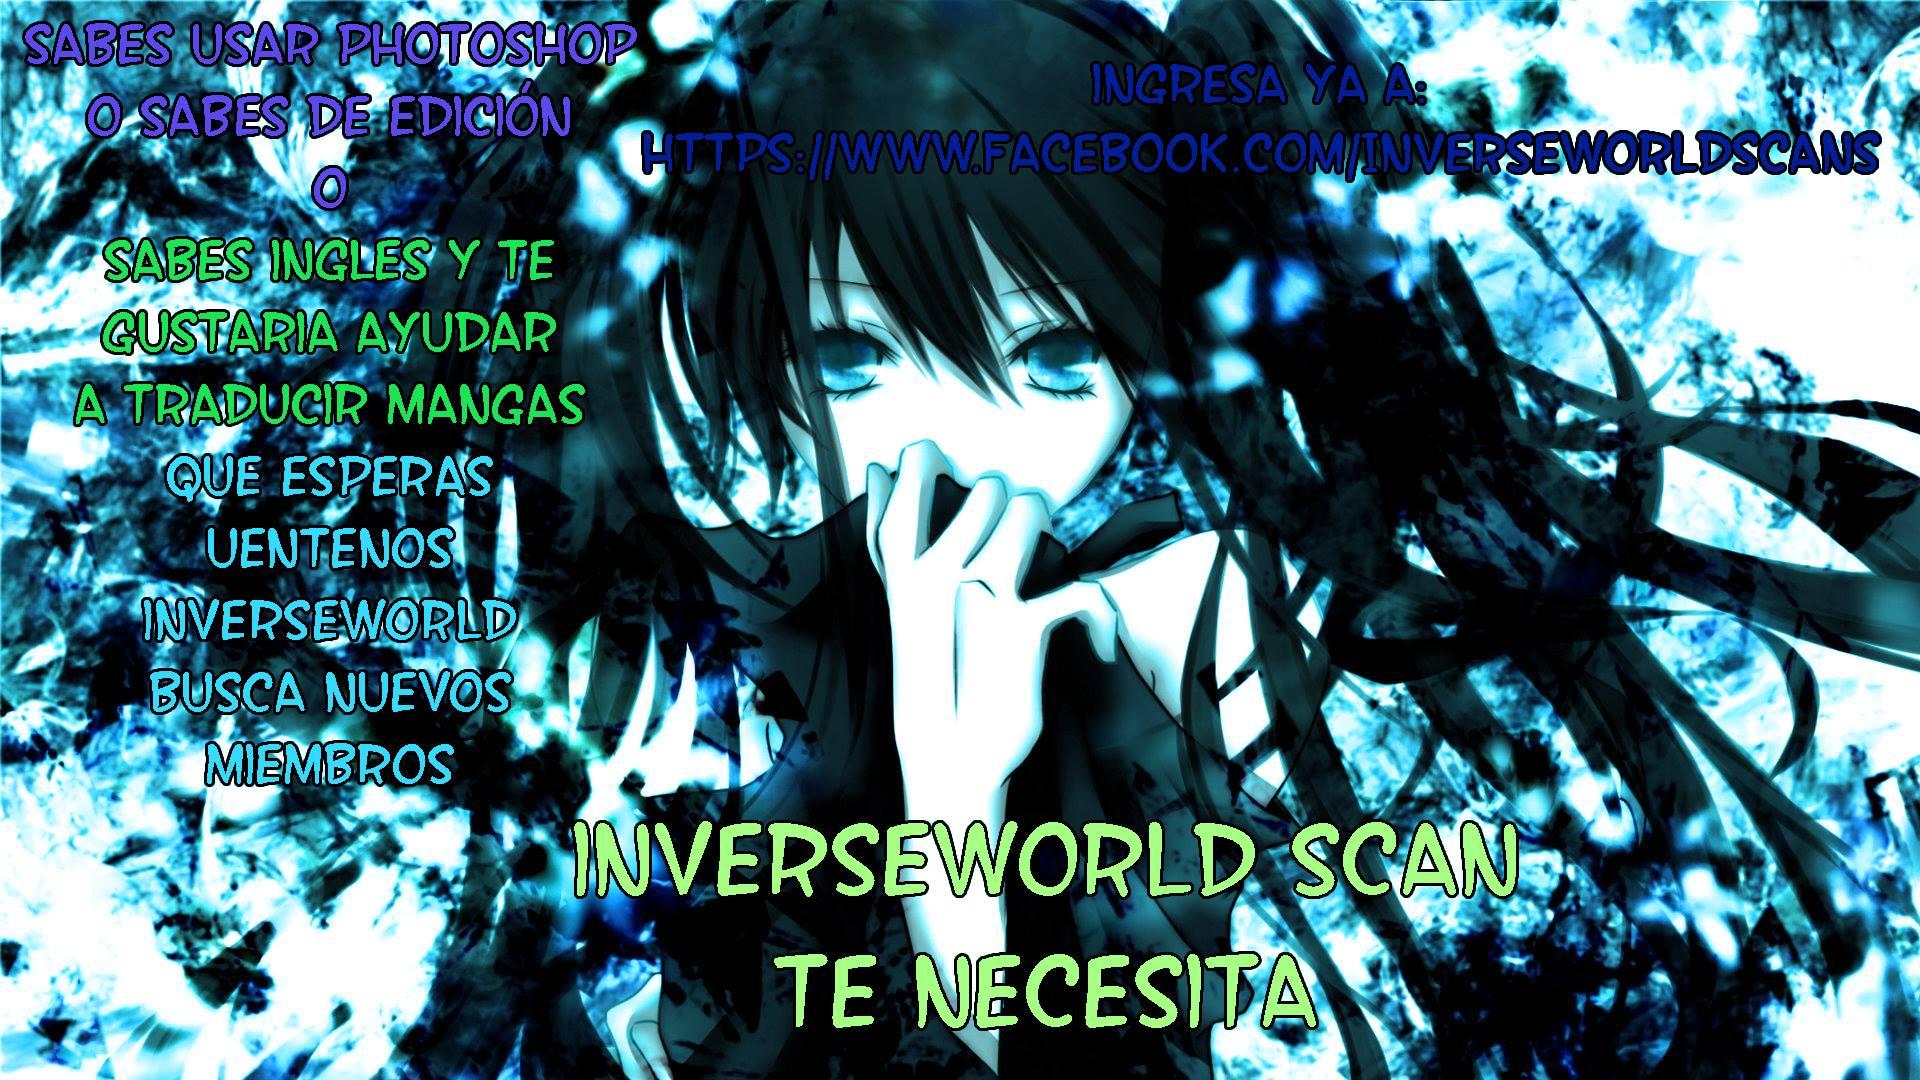 http://c5.ninemanga.com/es_manga/18/16210/415312/ed3c20fa2d9d250be25bd9cccb34790b.jpg Page 1